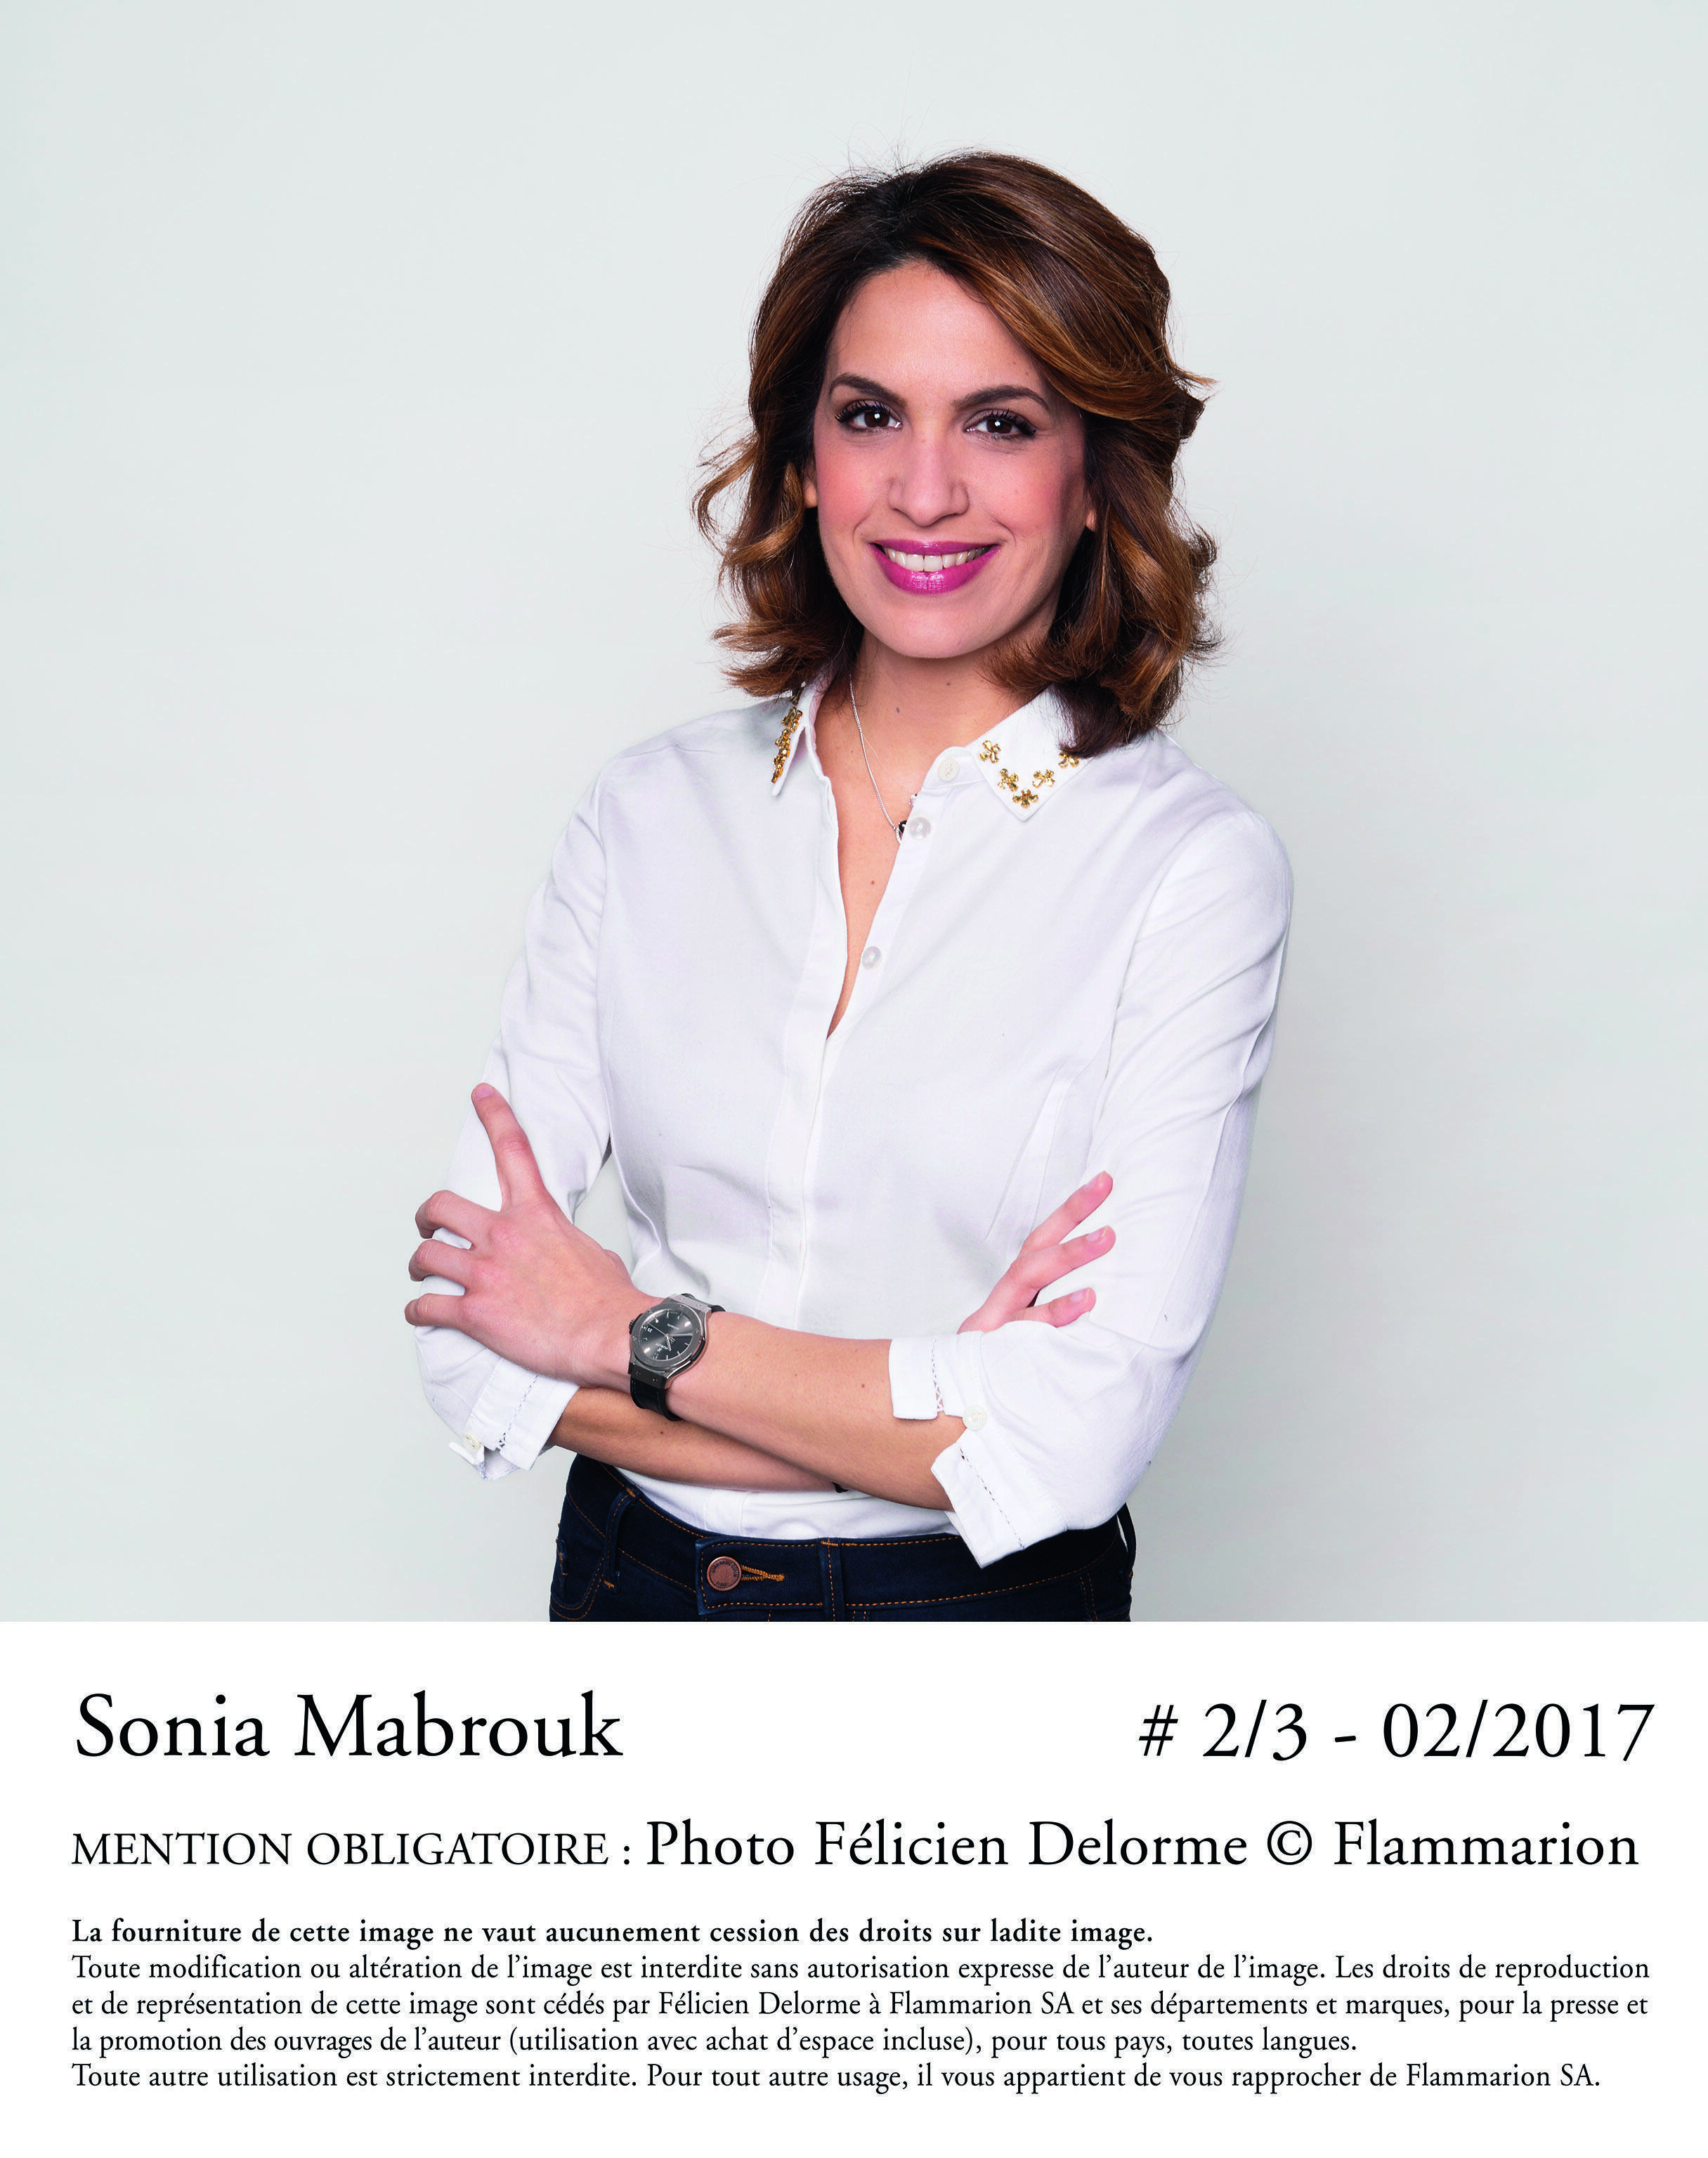 Sonia Mabrouk.